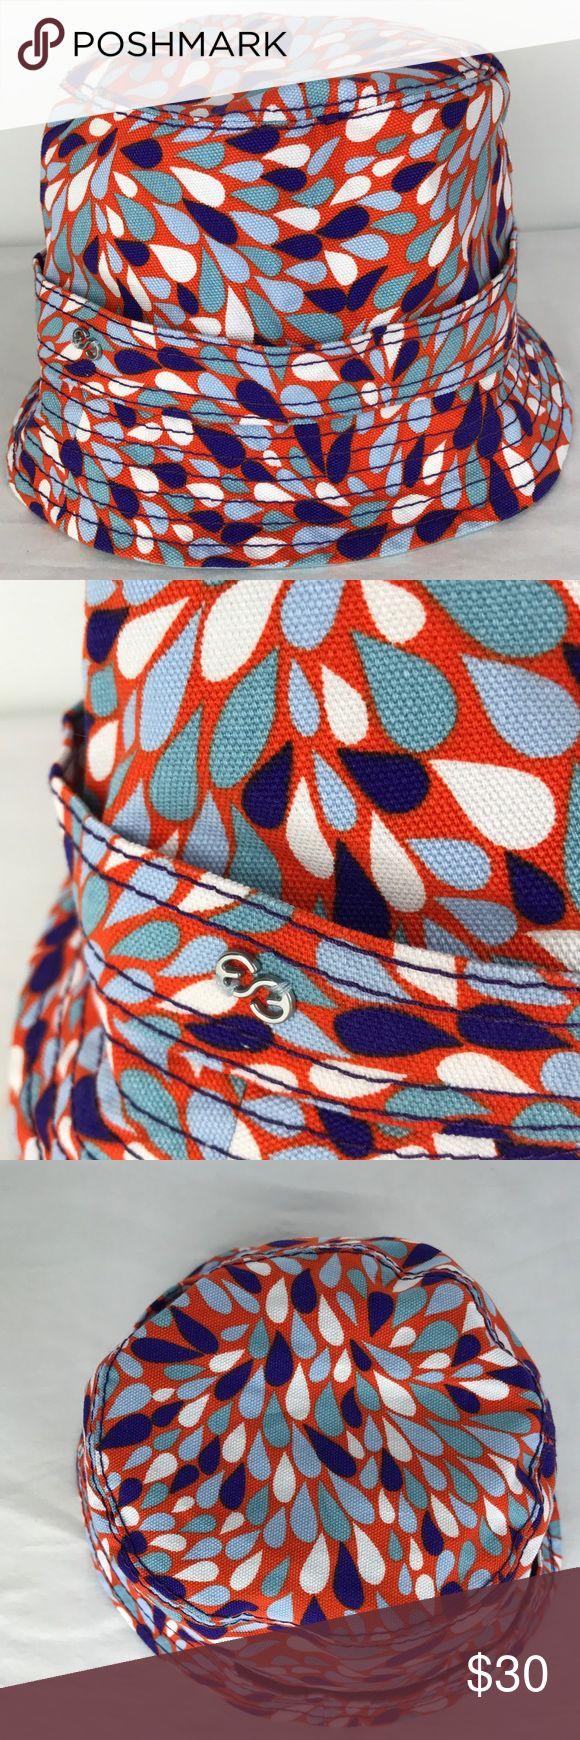 "Escada Summer Beach Hat Like new! Never worn, vibrant Escada beach hat.  Flat lay measurements: Diameter- 8""  C-12 Escada Accessories Hats"